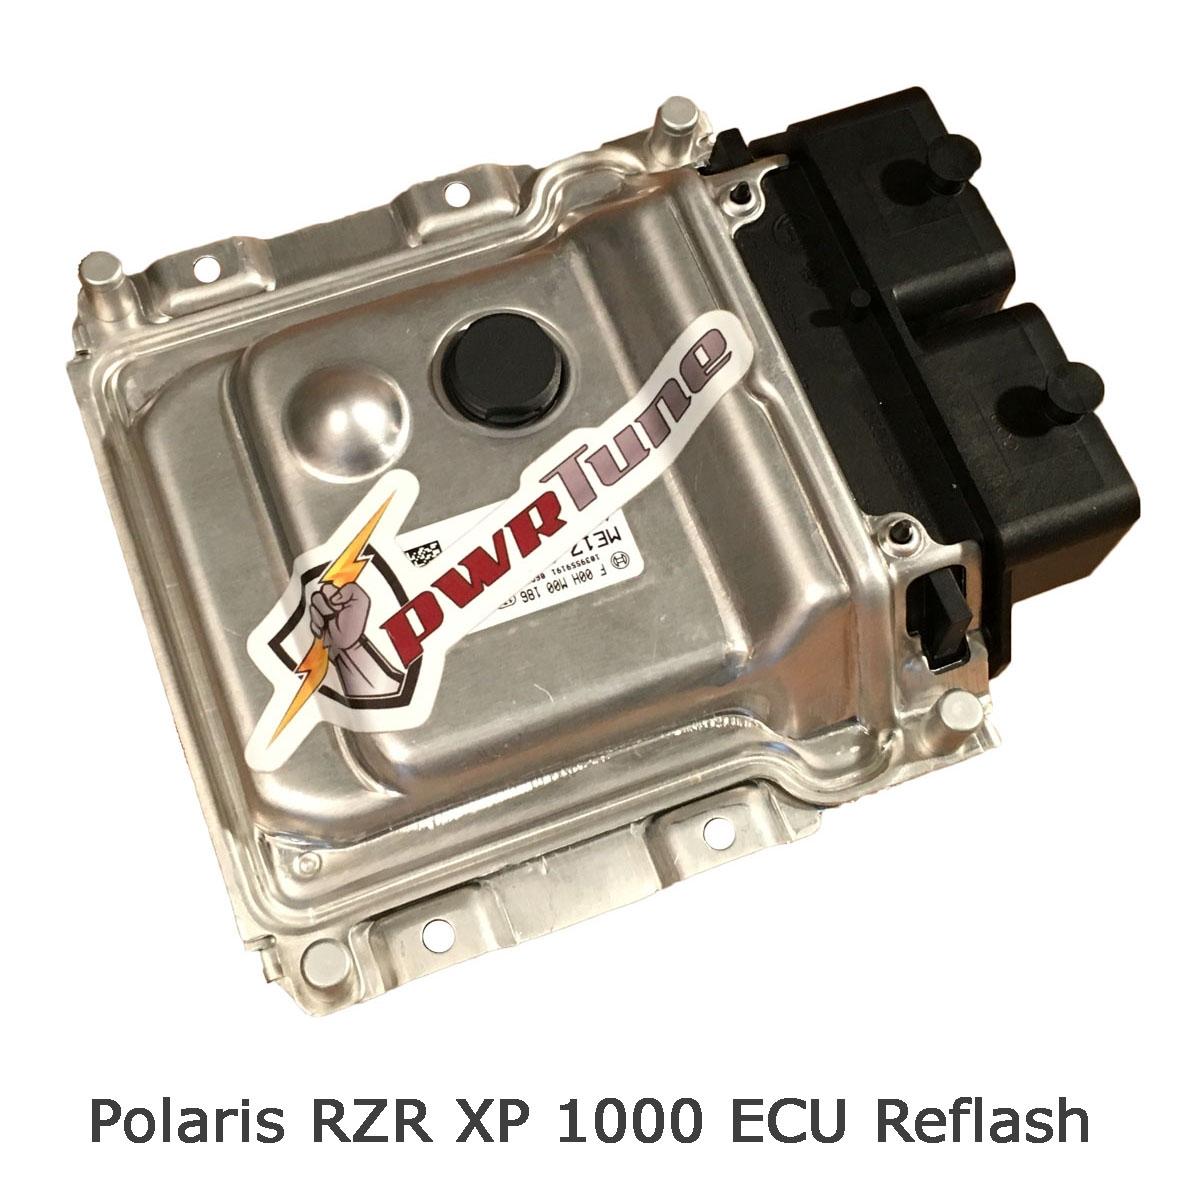 pwrTune ECU Reflash Polaris RZR XP 1000